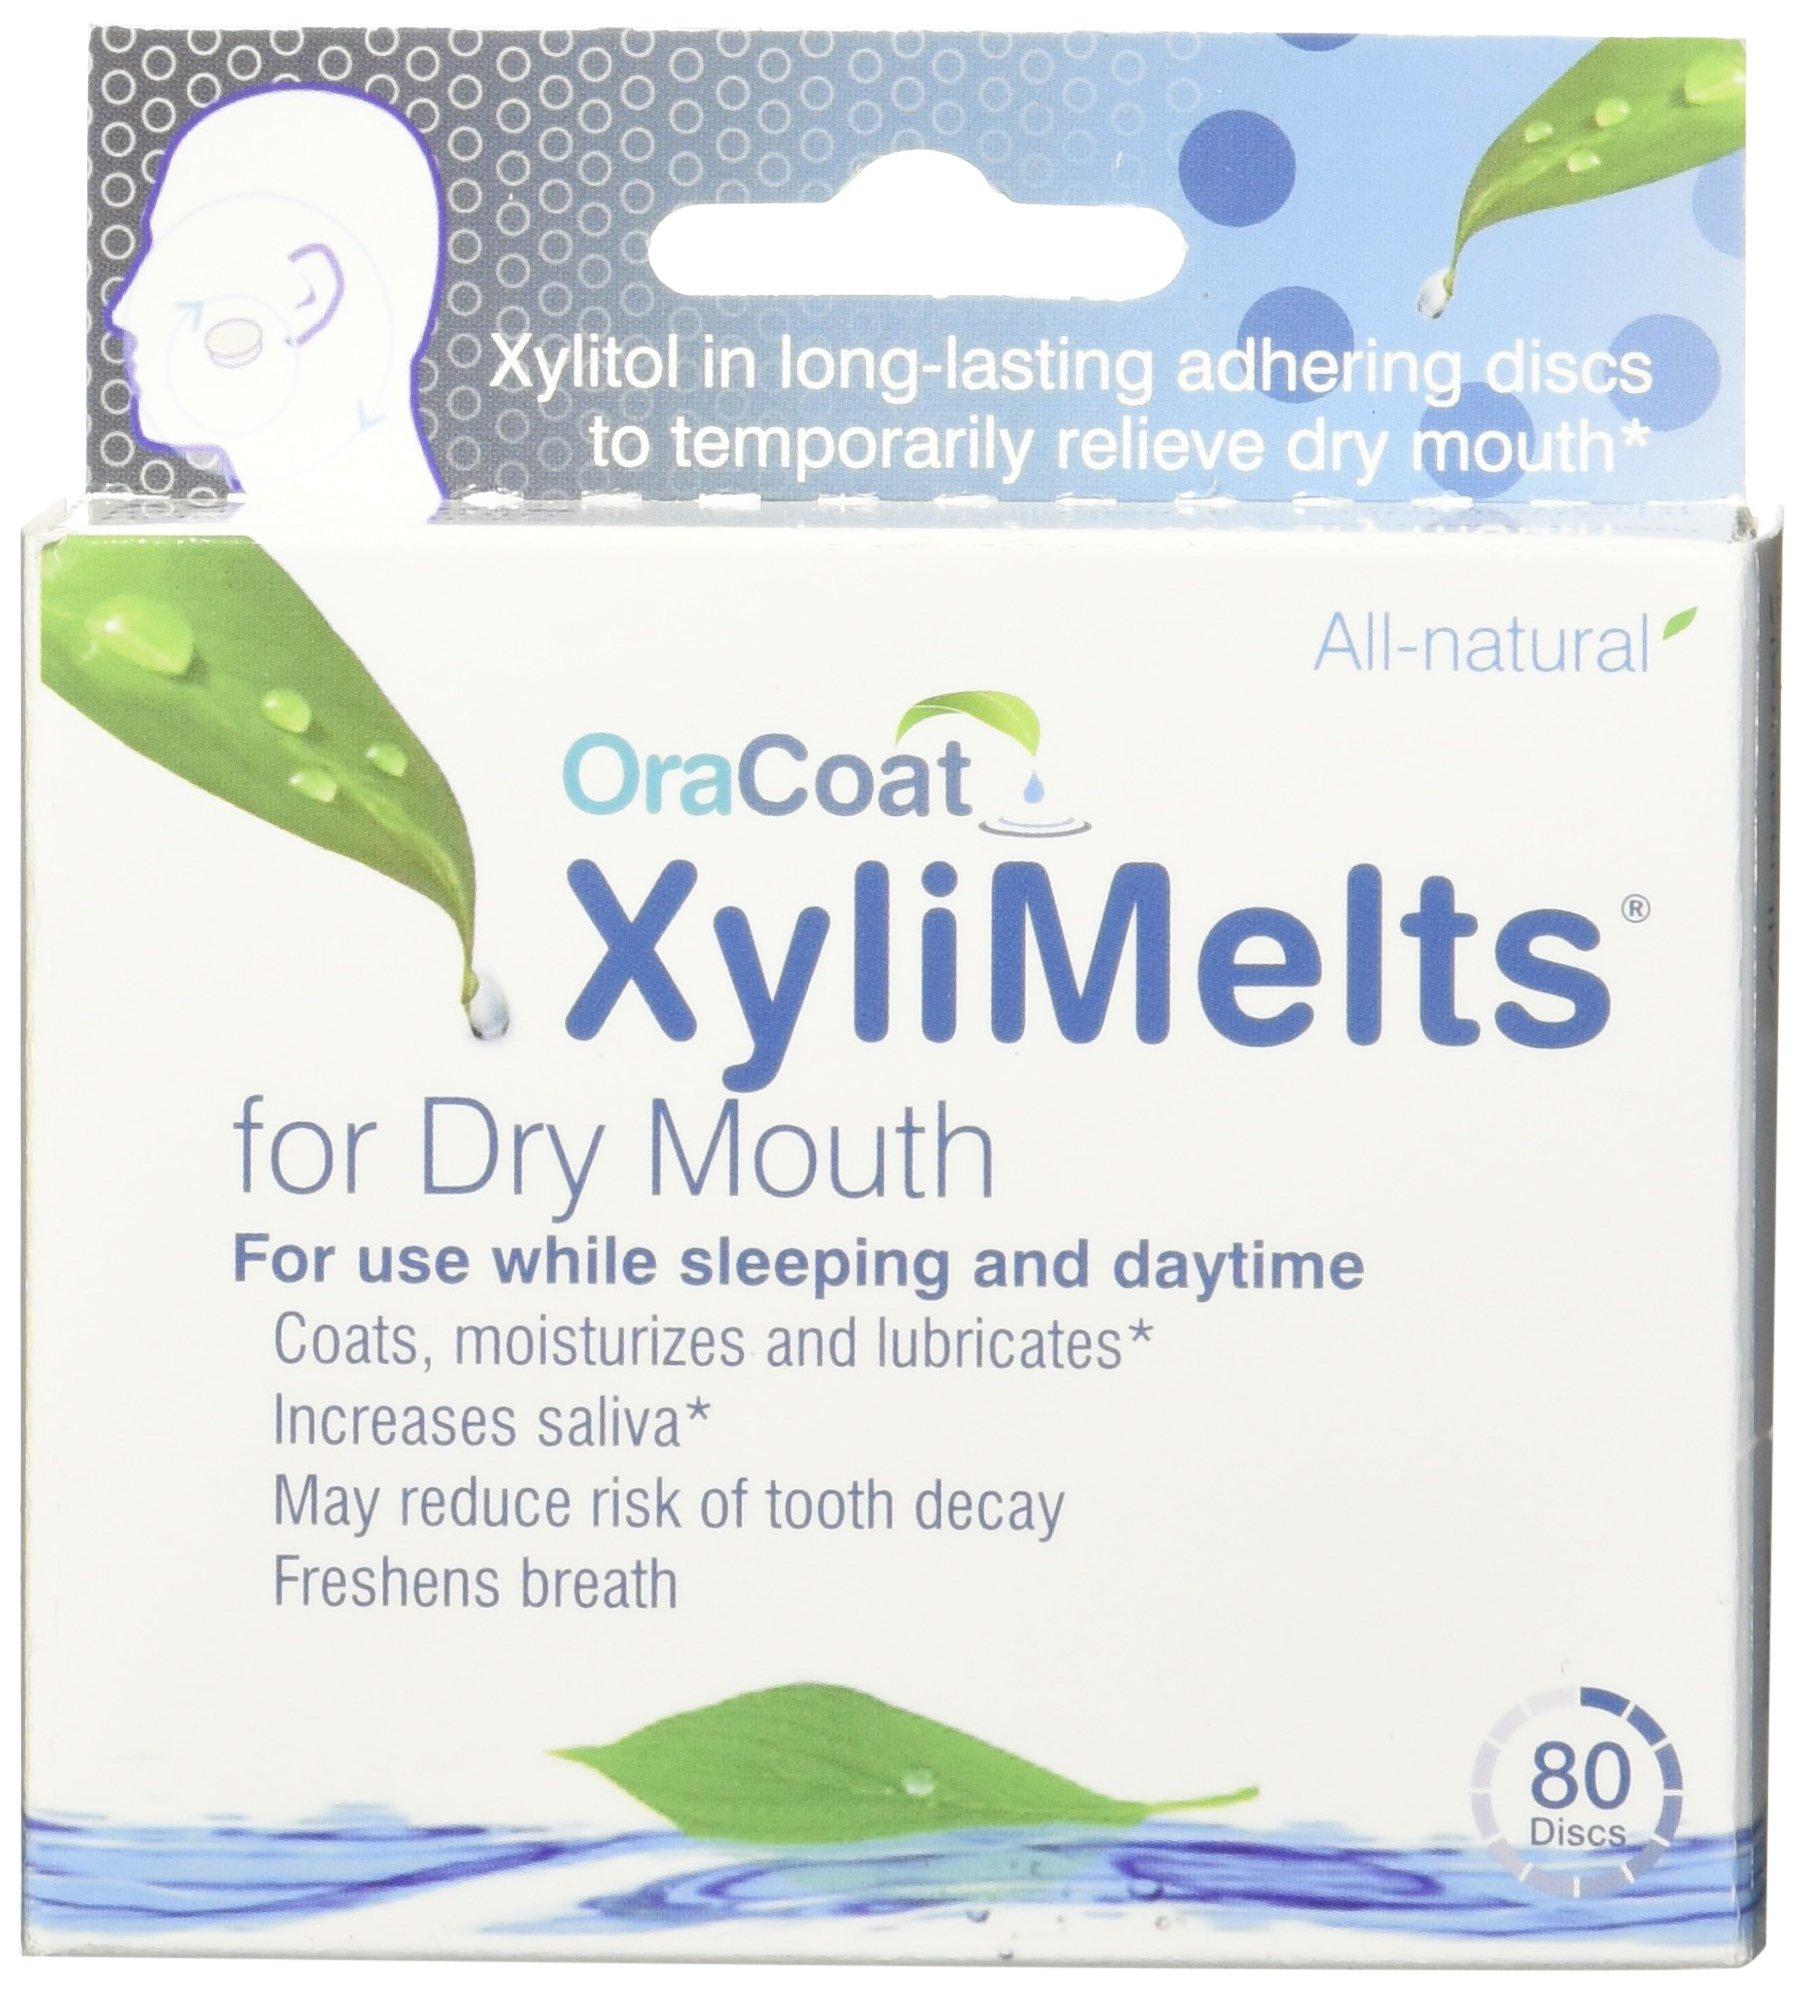 Oracoat Xylimelts Mild Mint Flavor, 80-Count Box